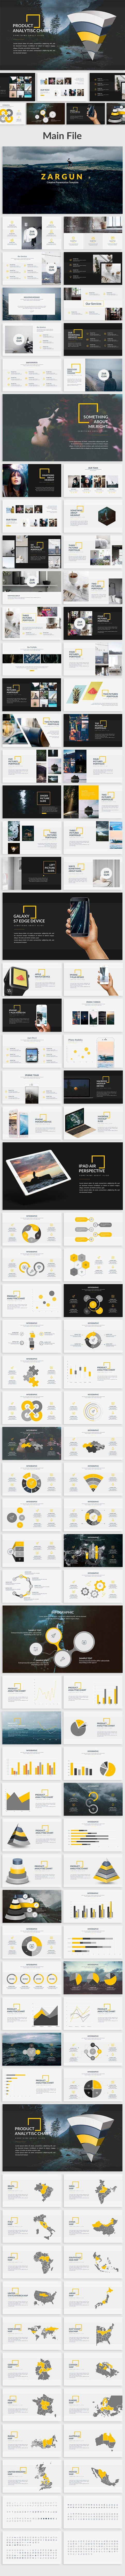 Zargun - Creative Powerpoint Template